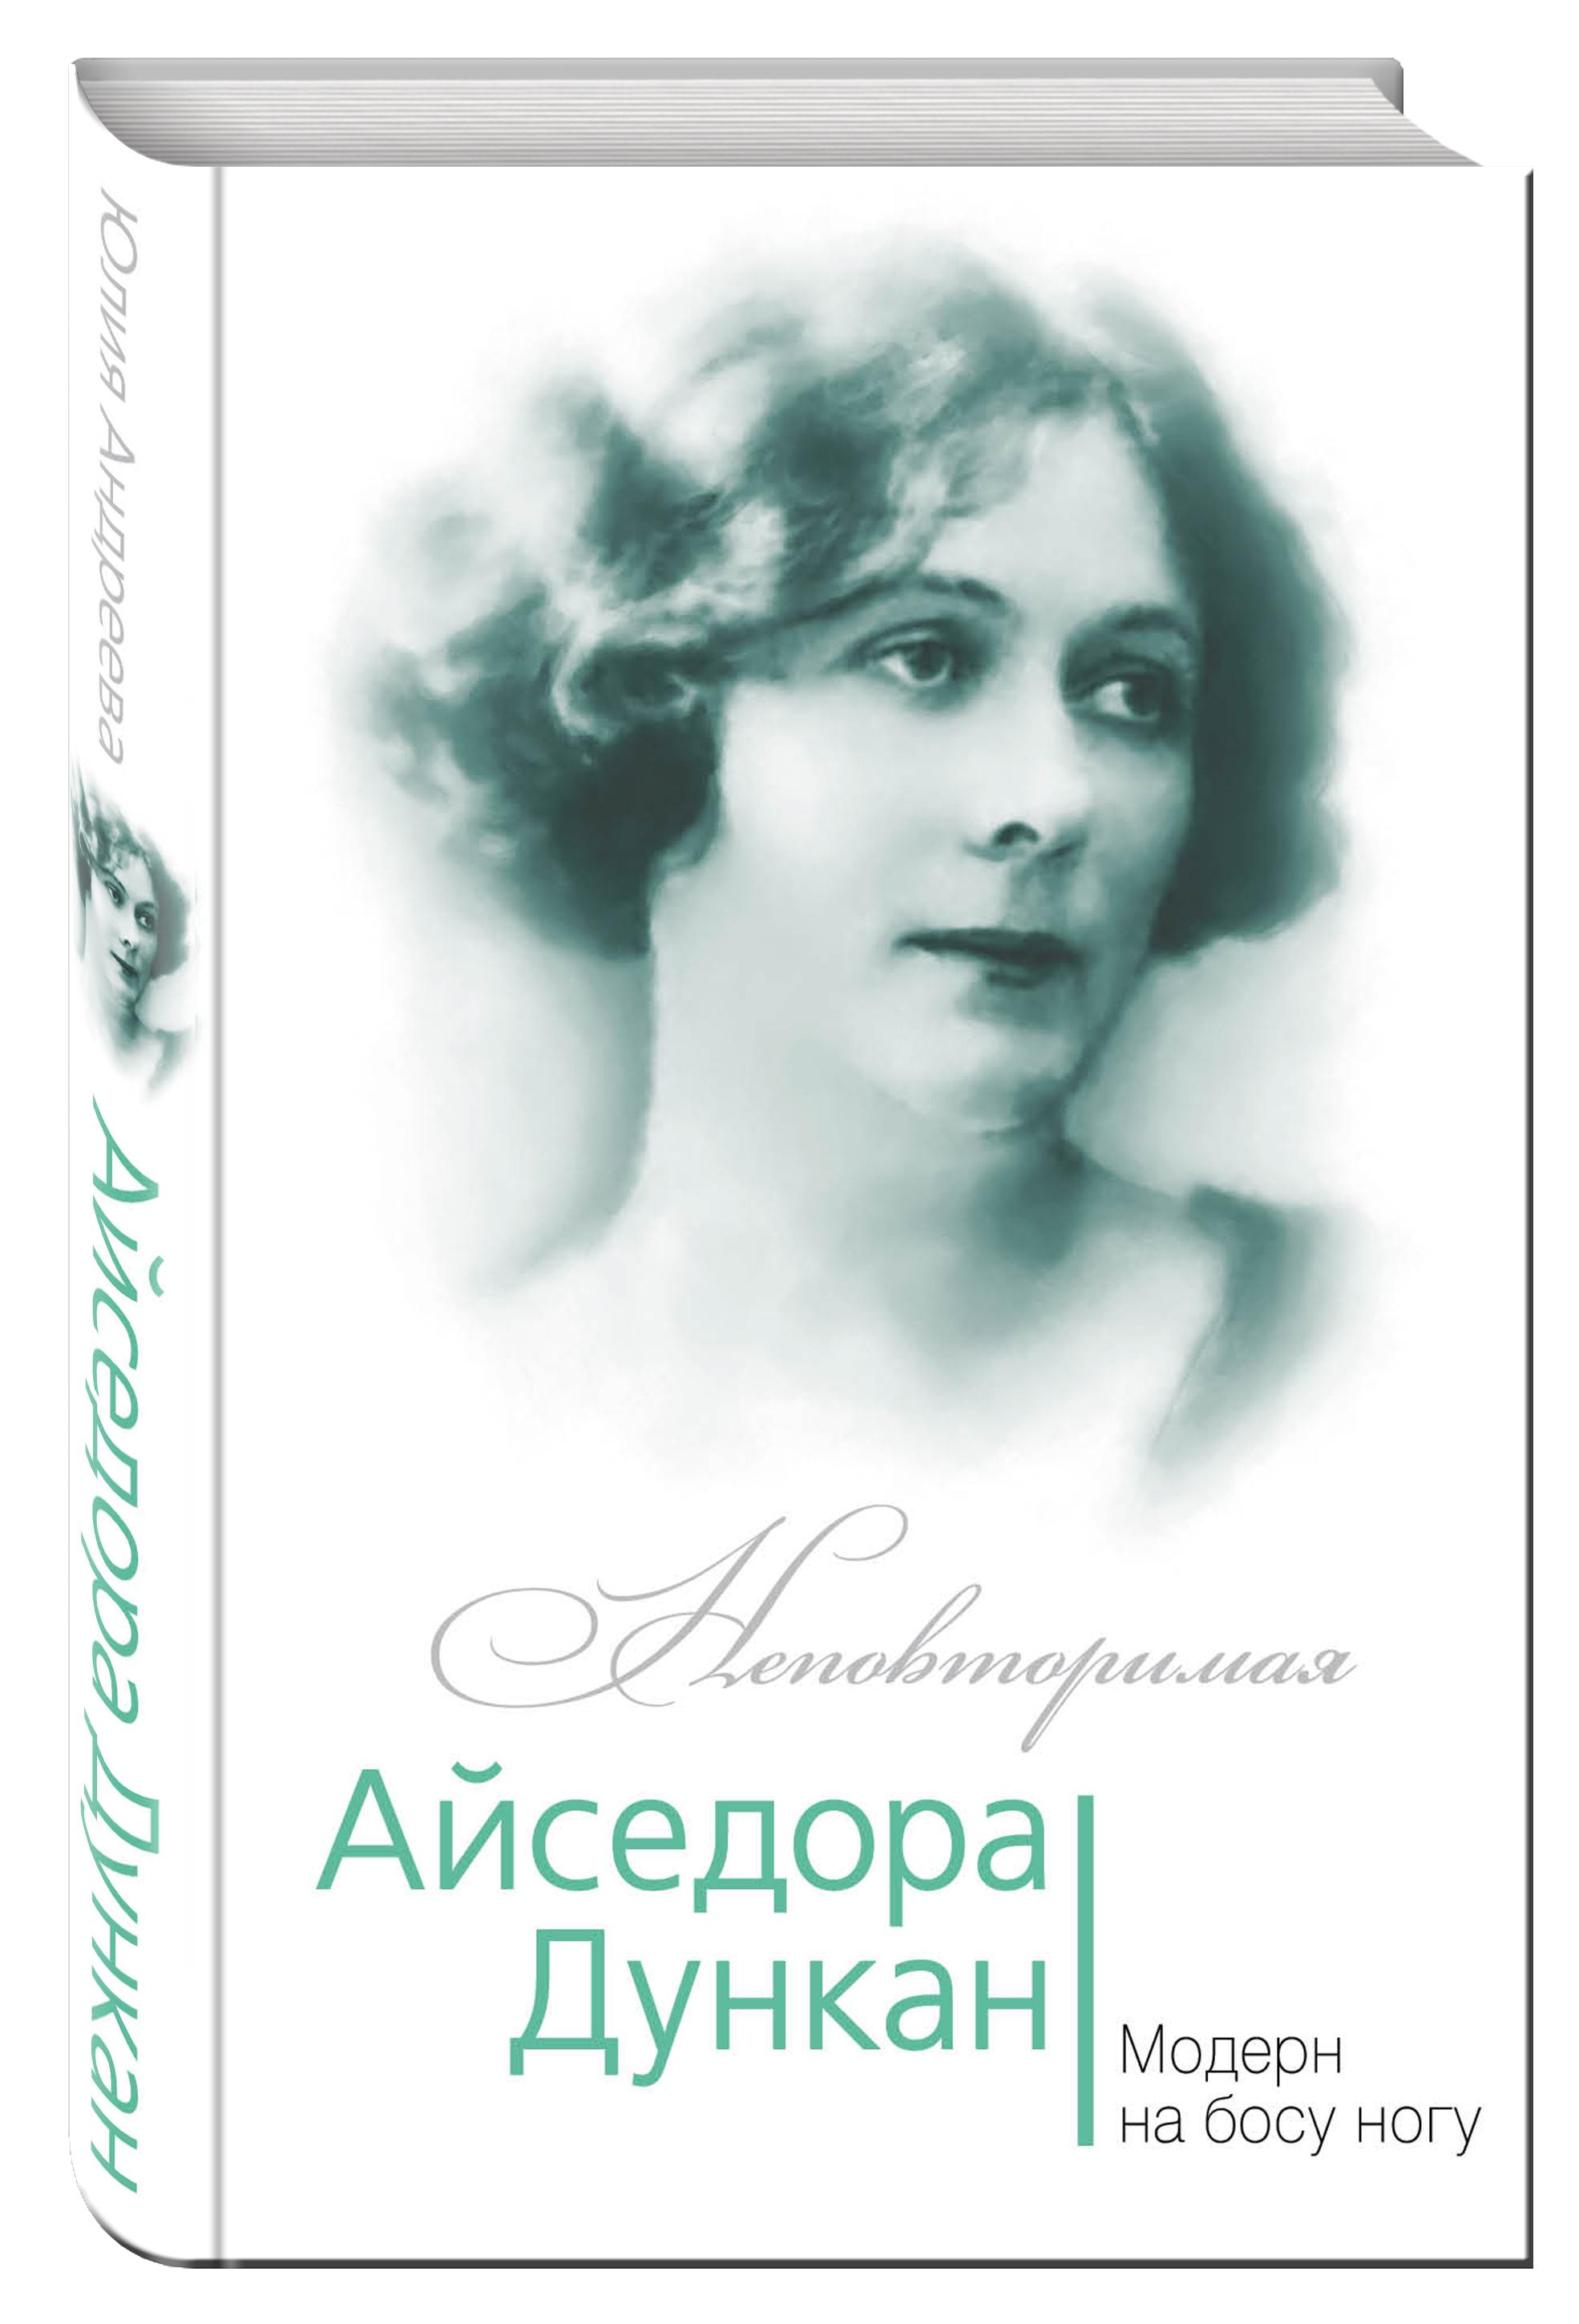 Андреева Ю.И. Айседора Дункан. Модерн на босу ногу